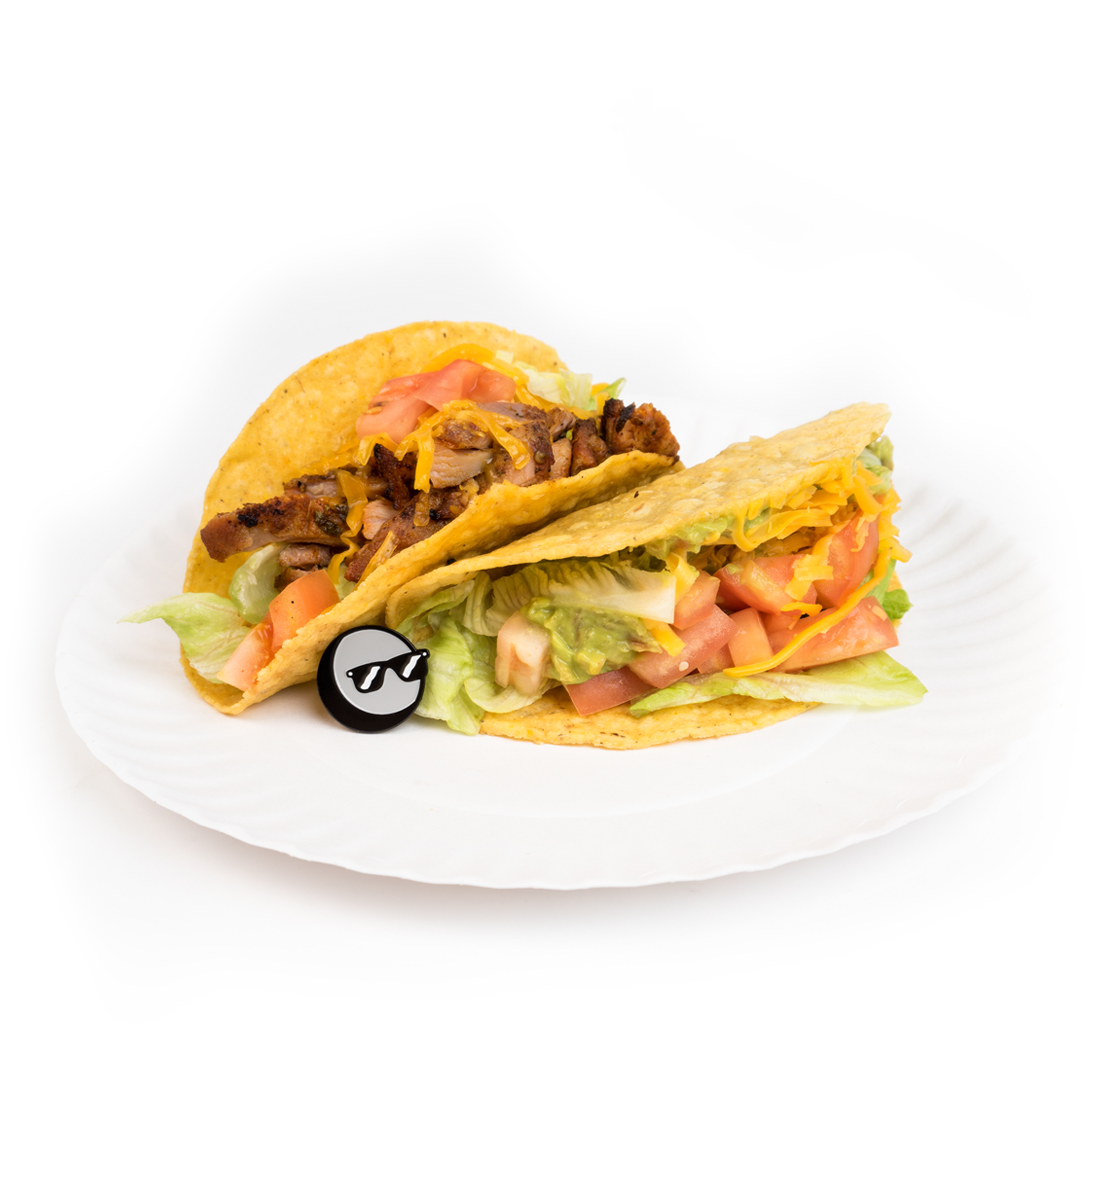 Tumblr - Tacos